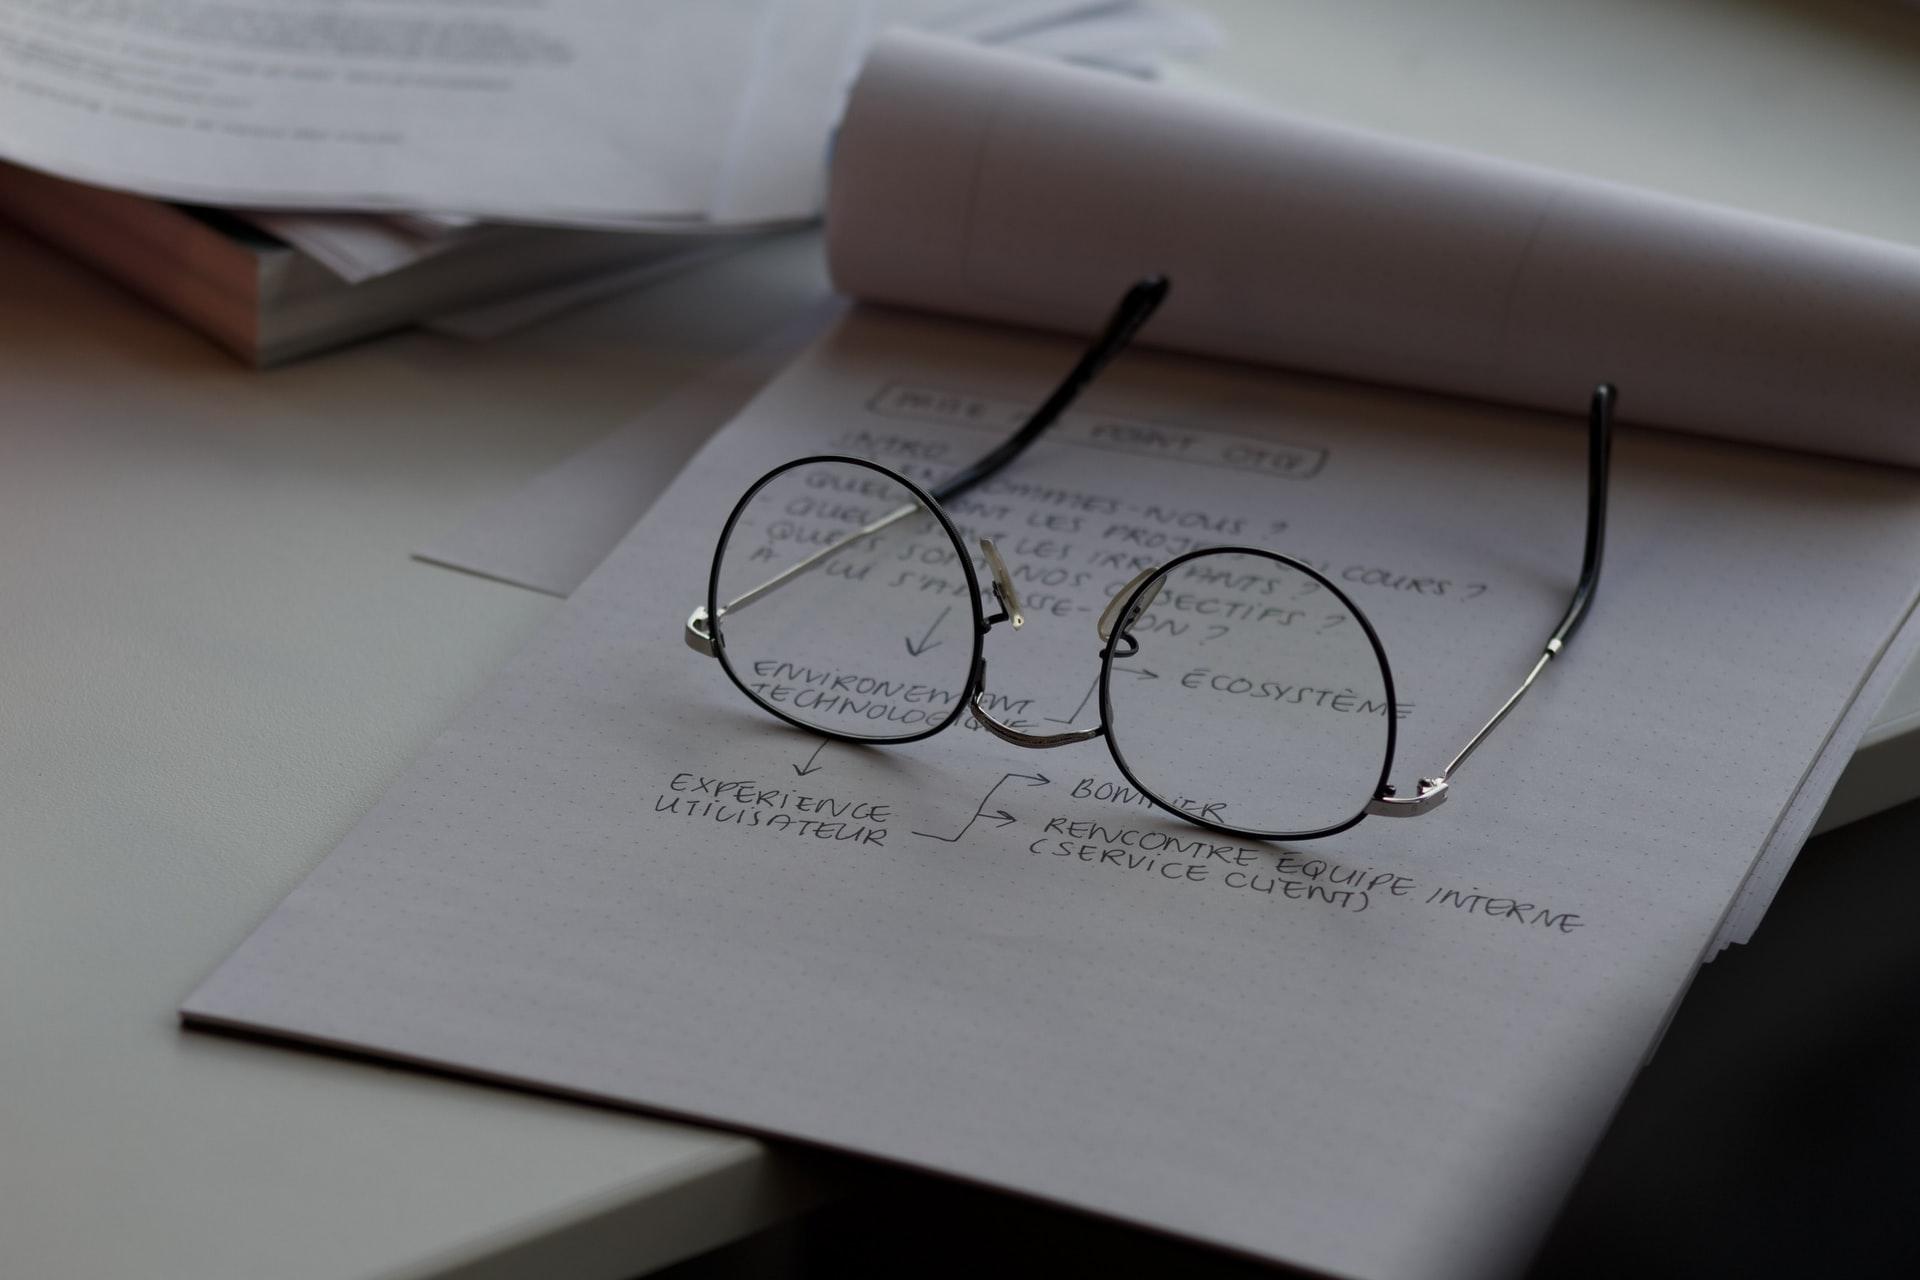 How to Write an Employee Handbook?